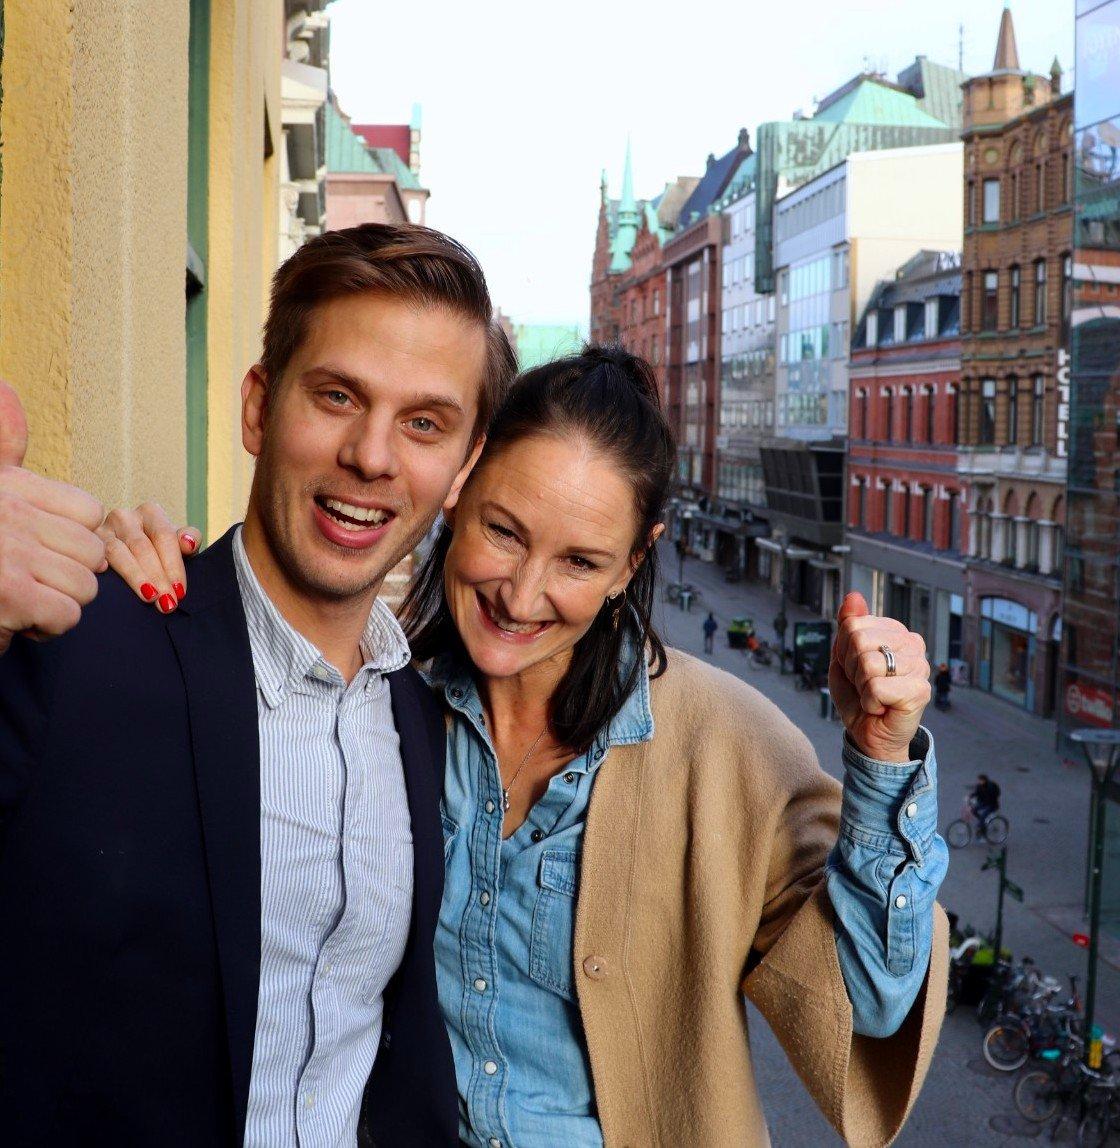 Samir Smajic & Frida Ahrenby GetAccept